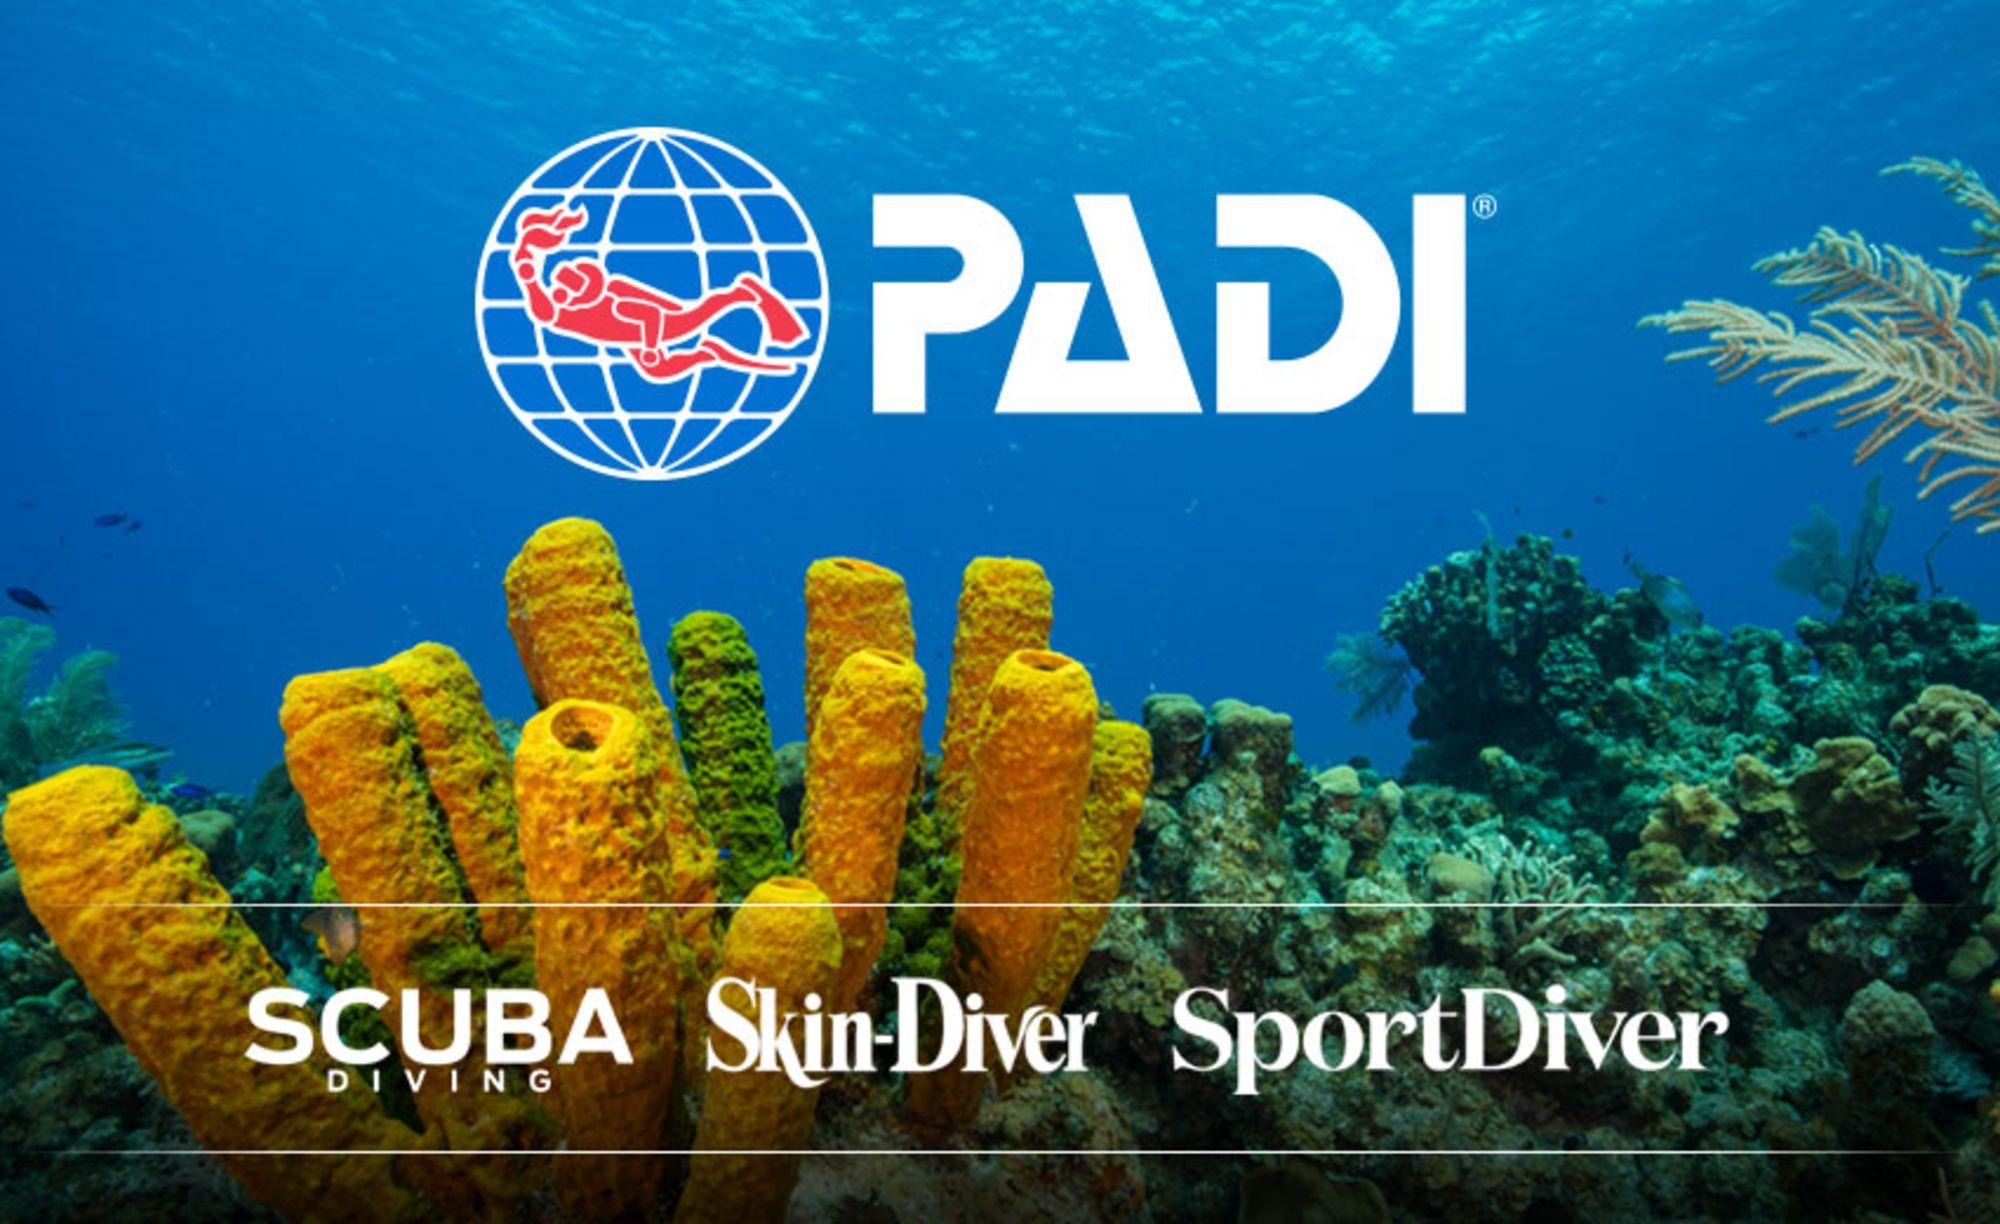 PADI Sets to Energize Dive Community through Integration of Bonnier Corporation's Dive Media Group